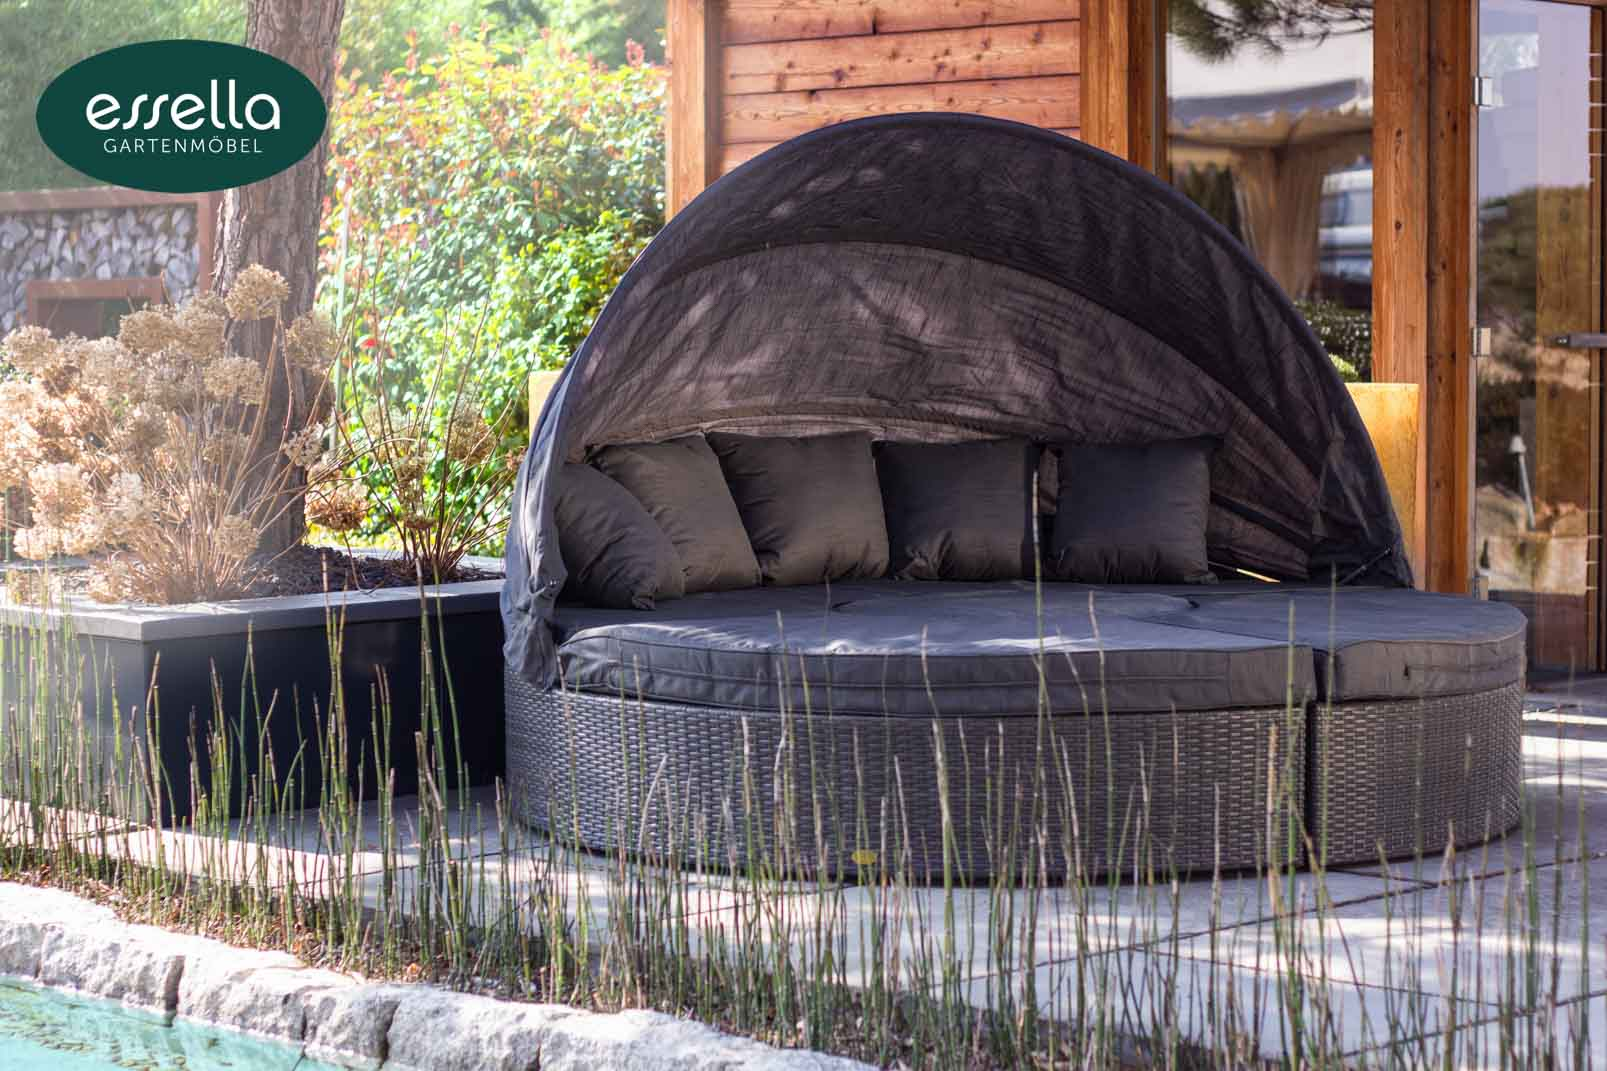 essella polyrattan sonneninsel honolulu flachgeflecht. Black Bedroom Furniture Sets. Home Design Ideas